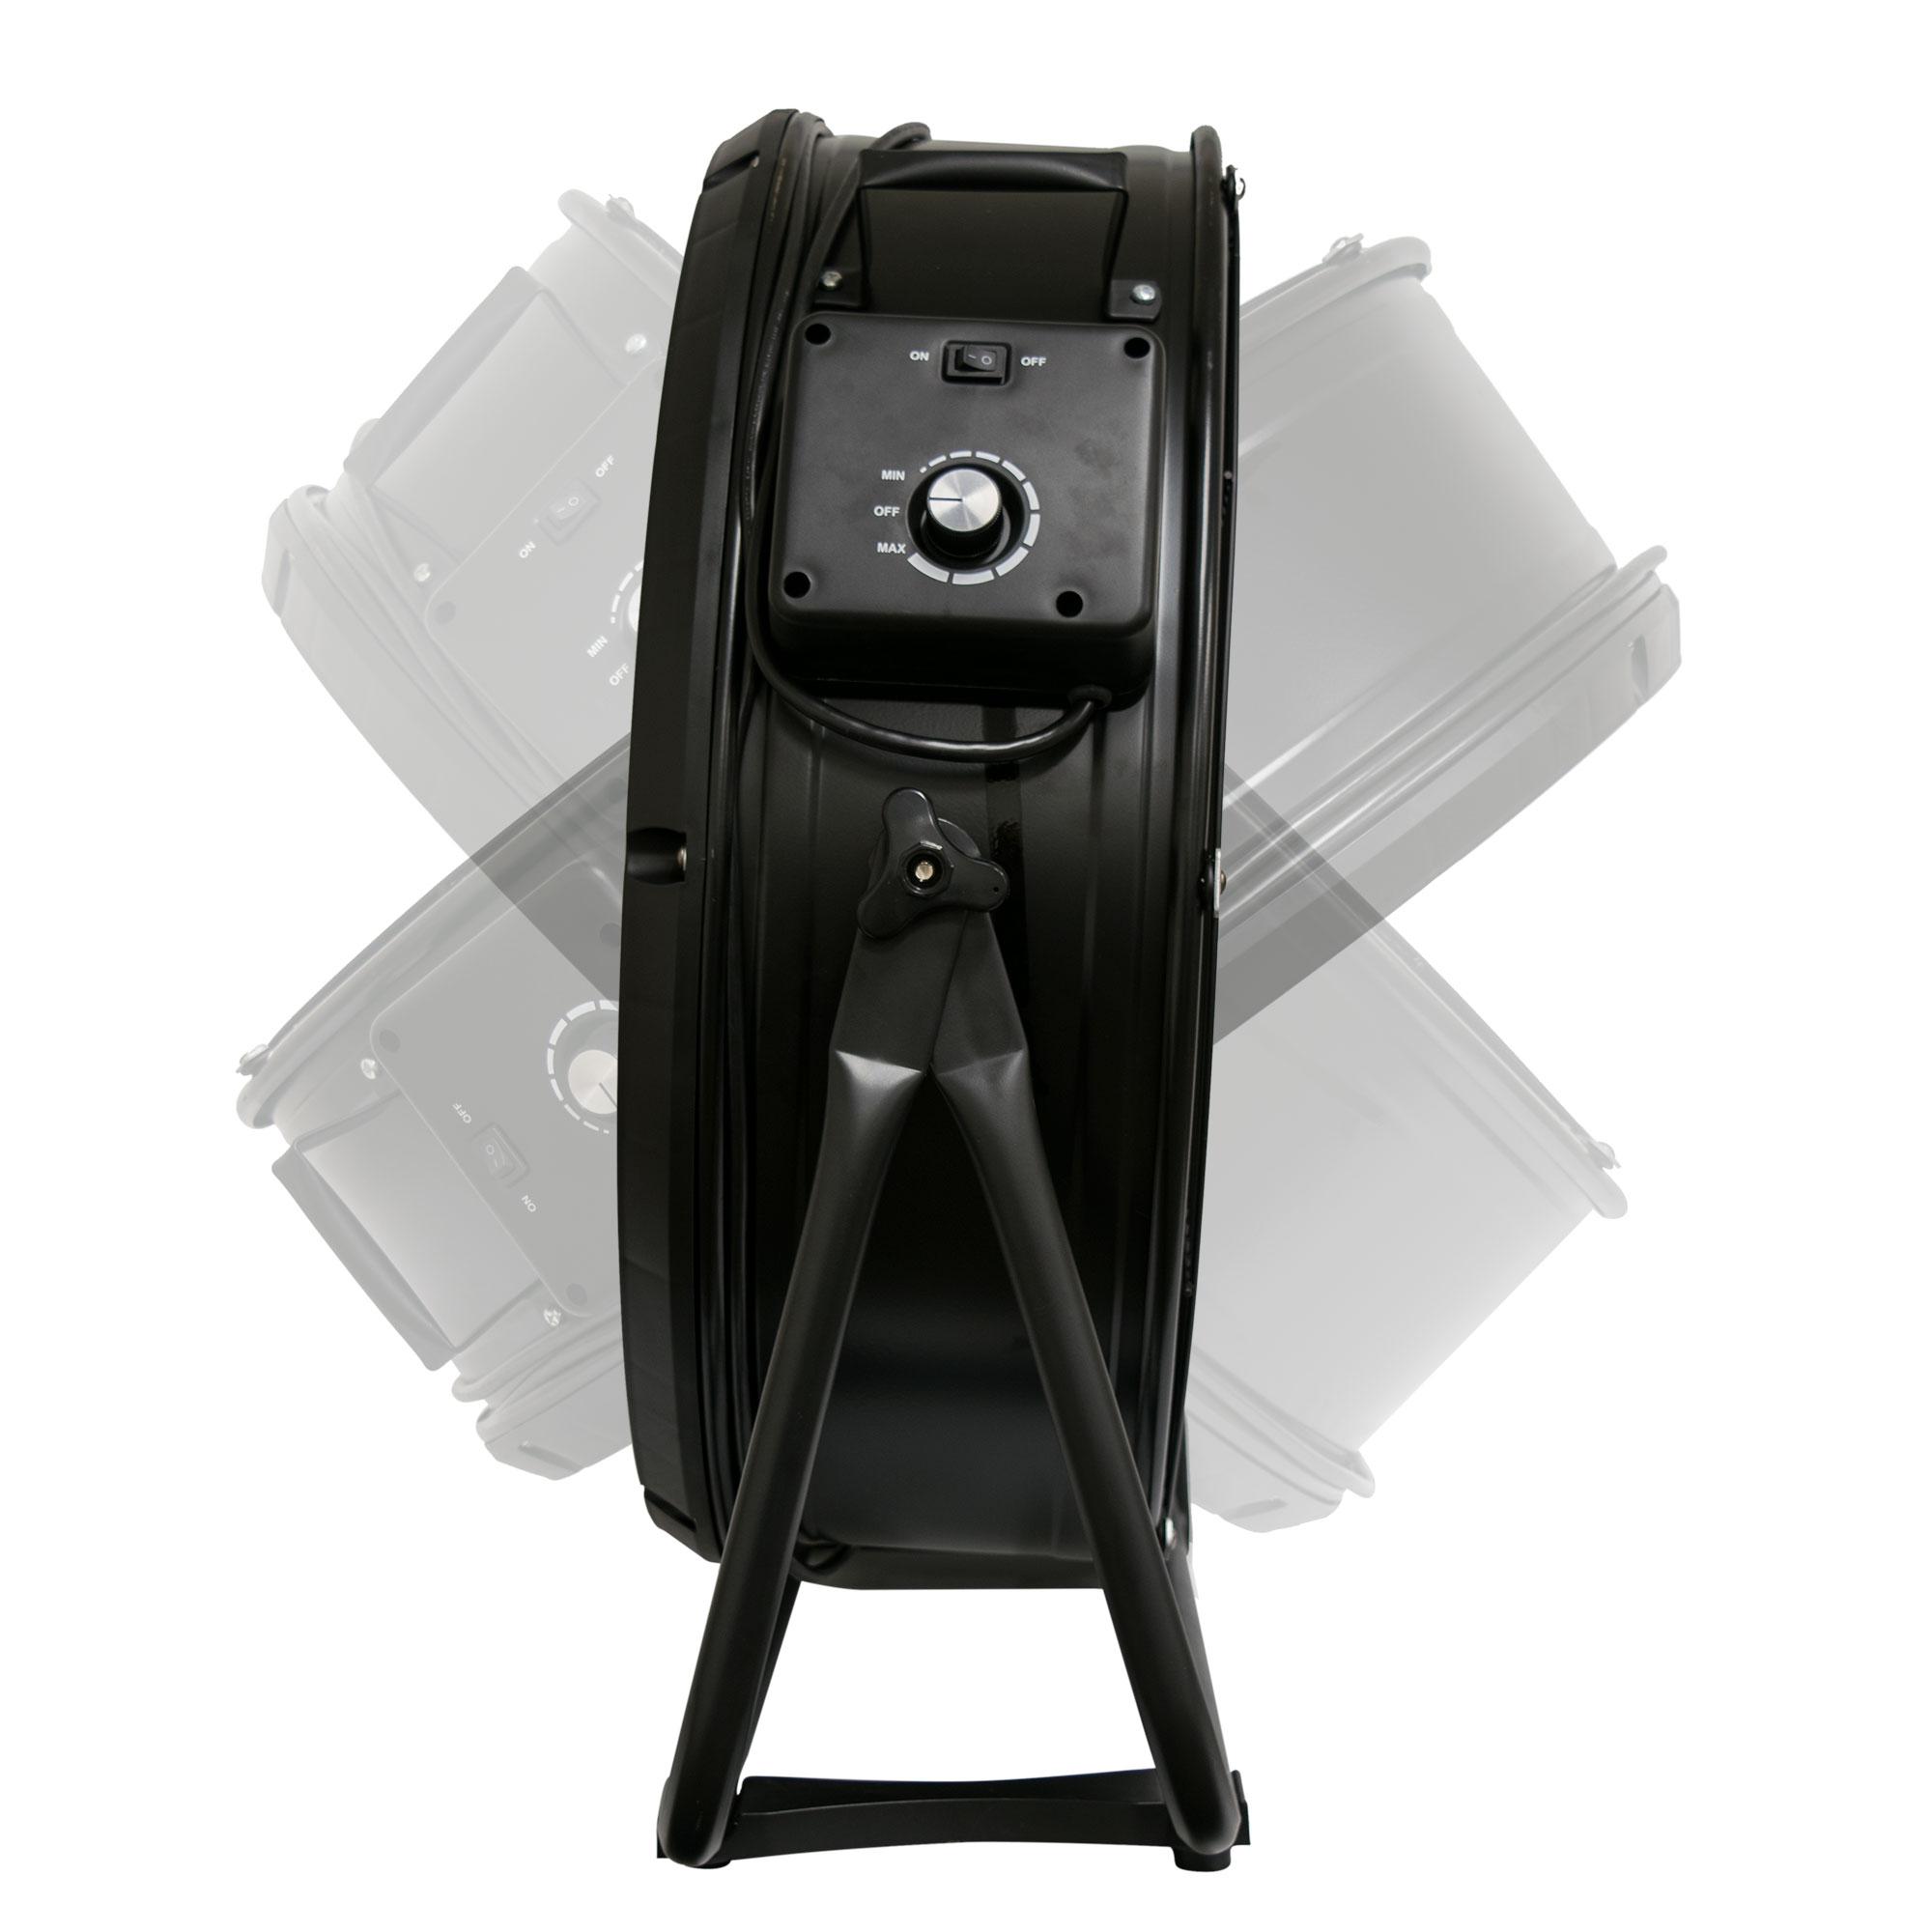 FD650-Rotation